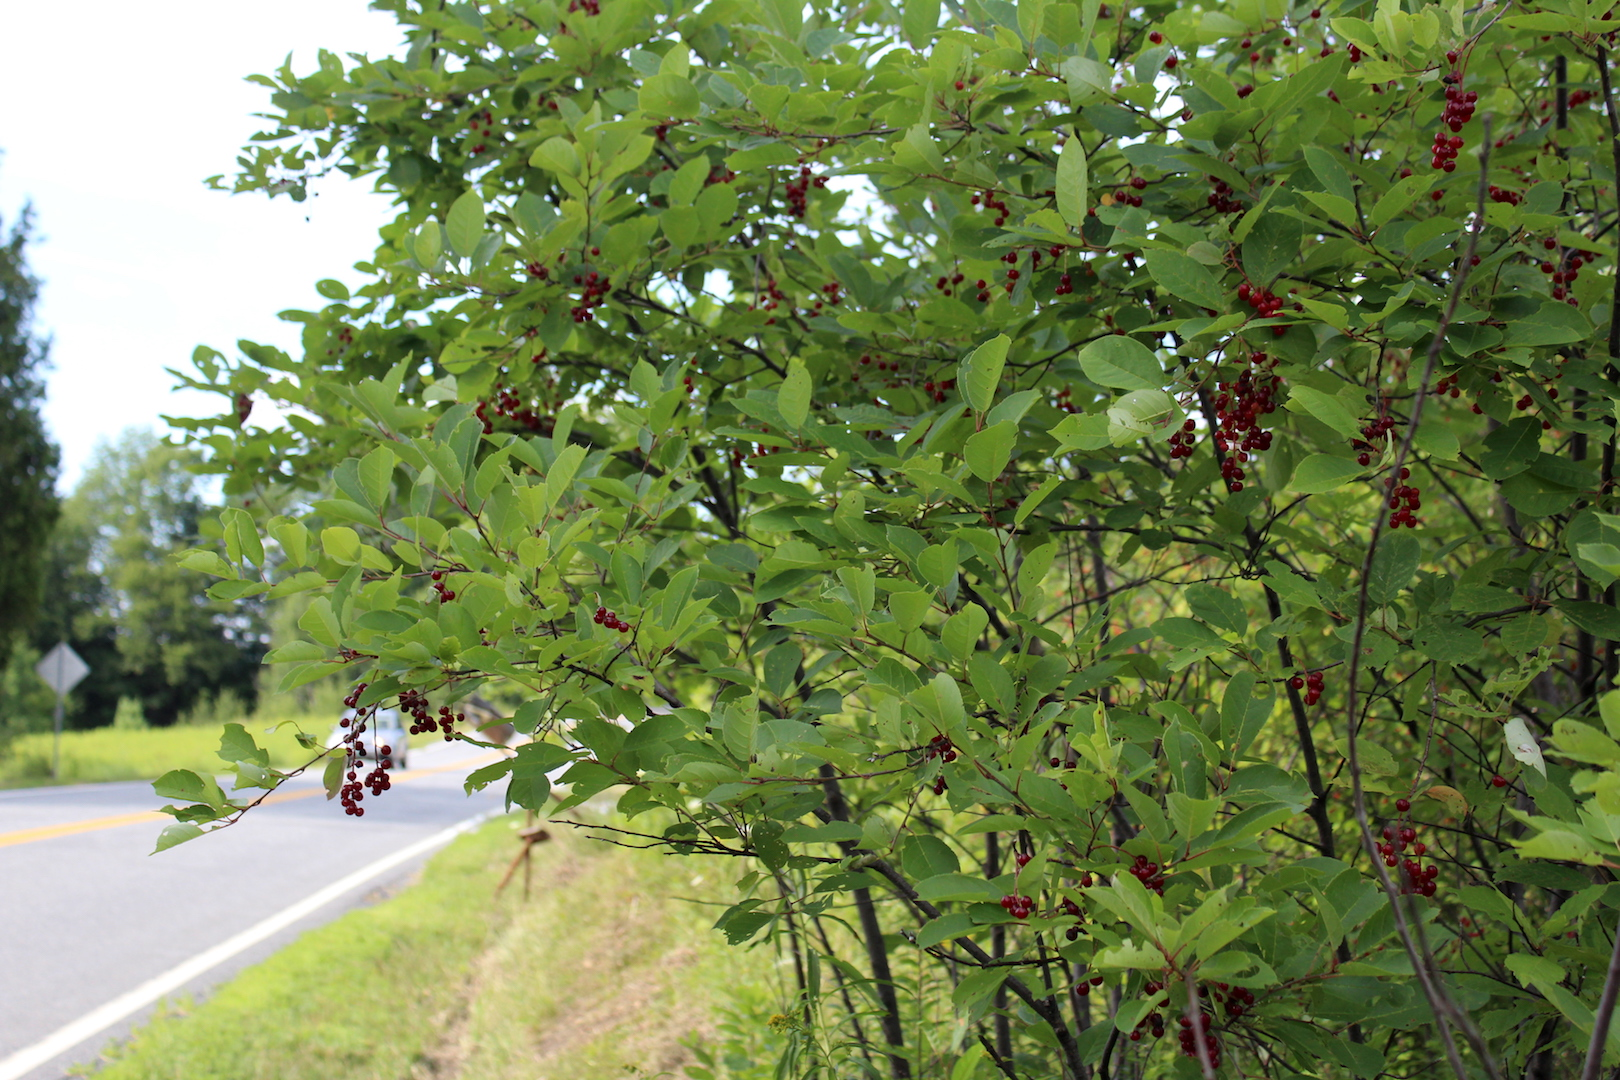 Roadside Chokecherry Bush